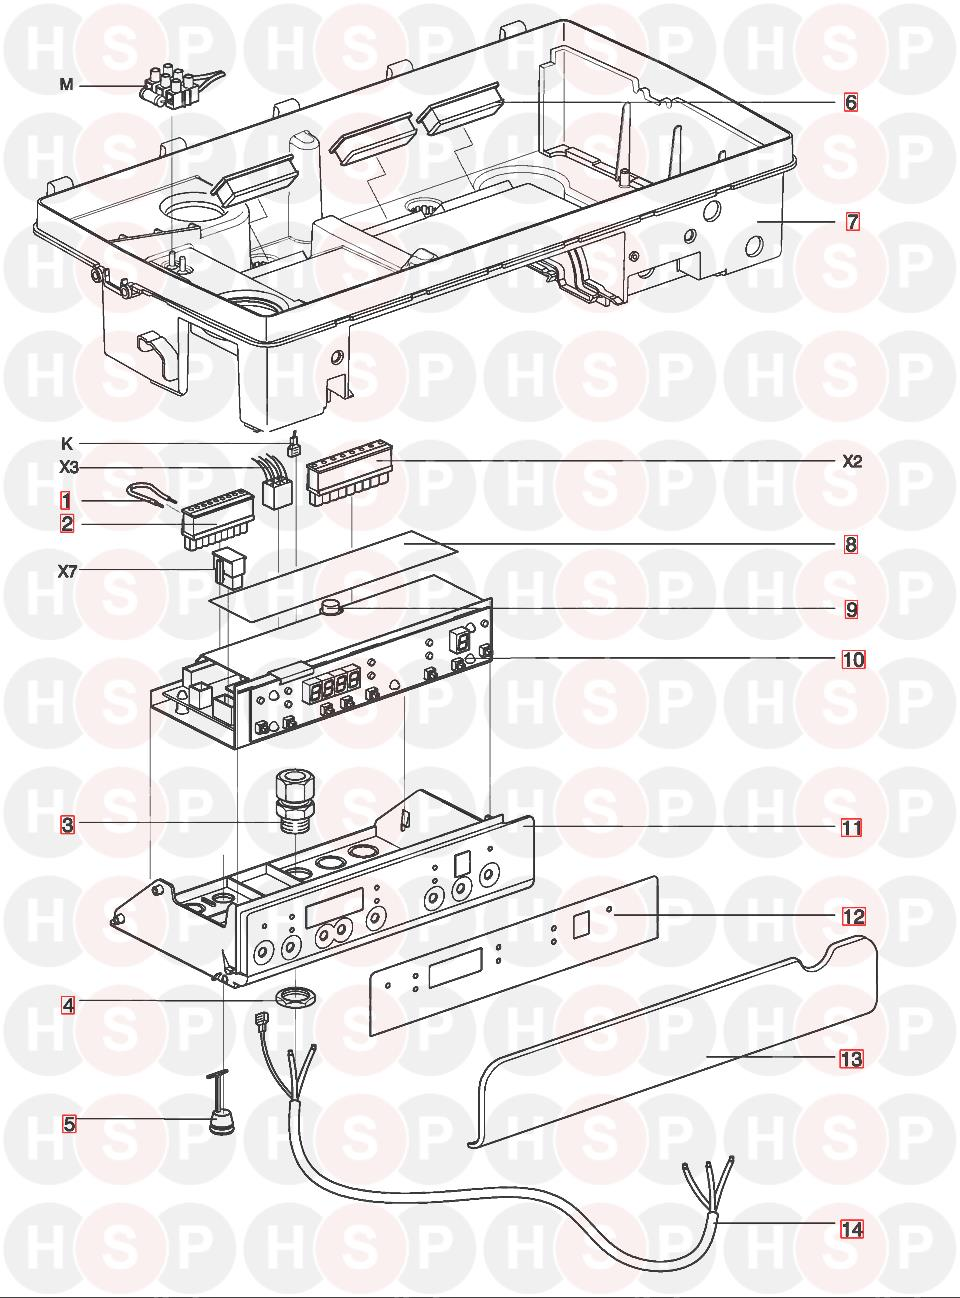 Intergas 28  24 Hre  Boiler Controls Diagram